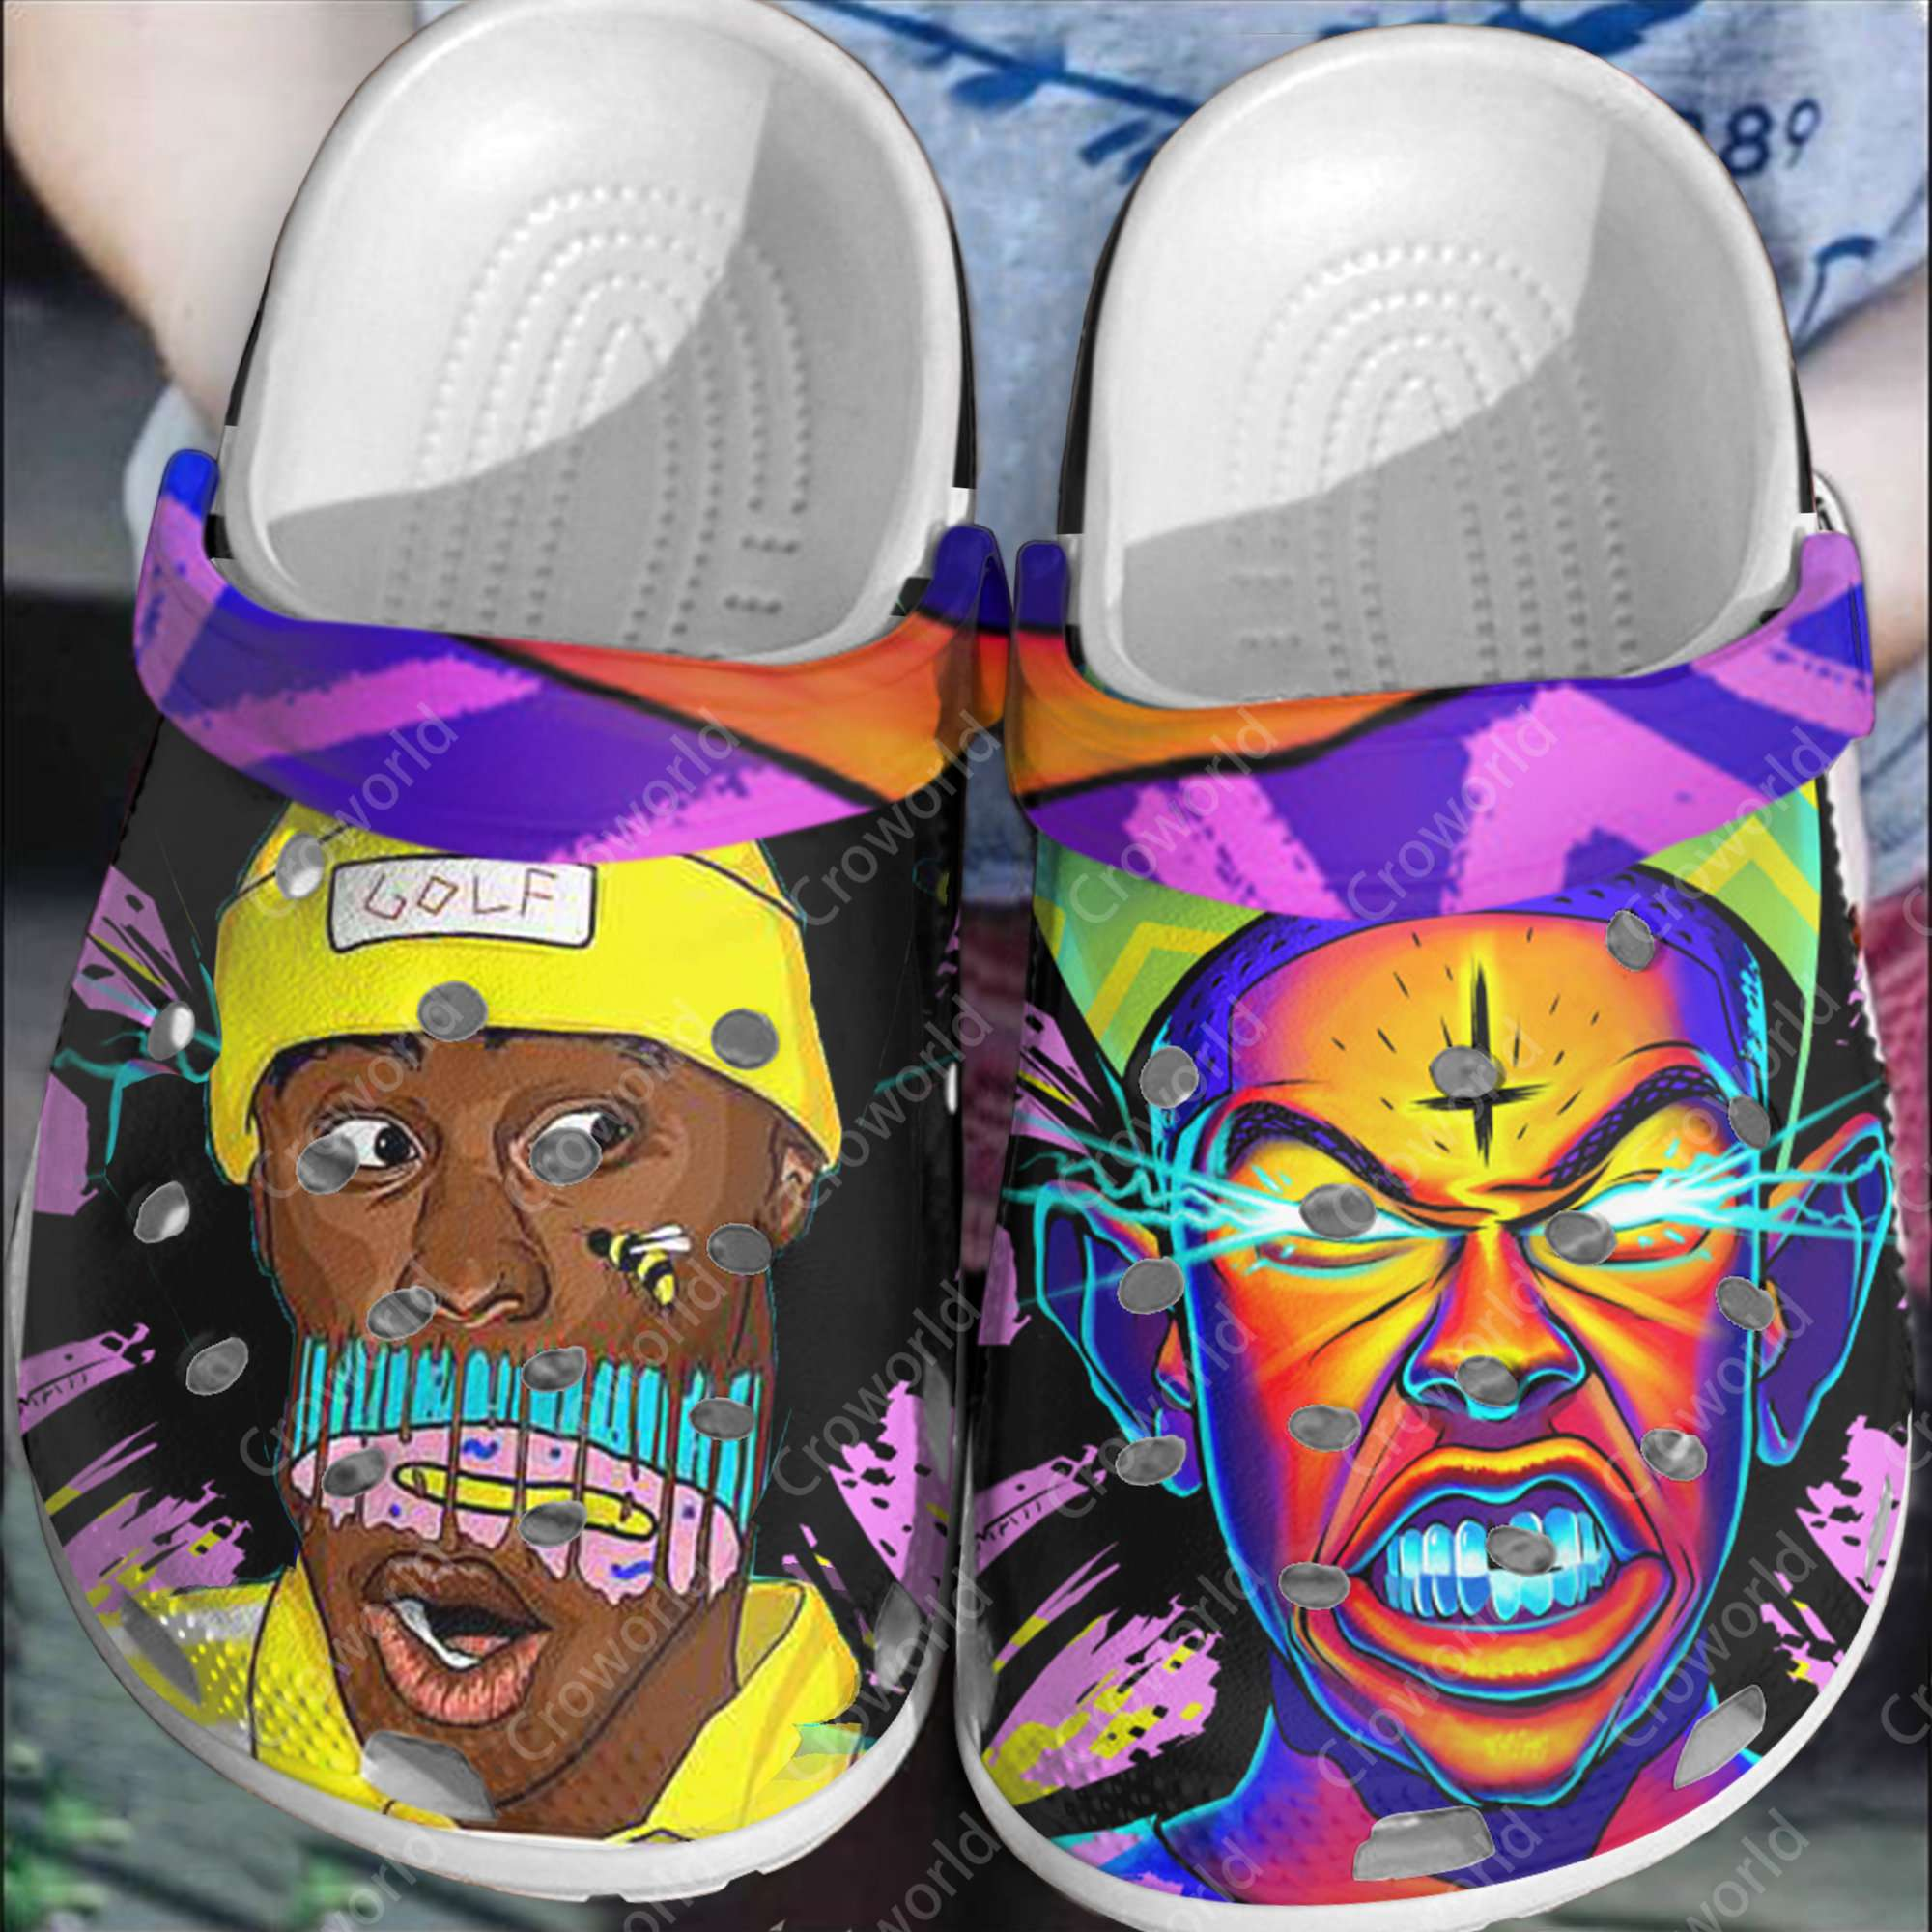 High Quality Crocs Clog Shoes